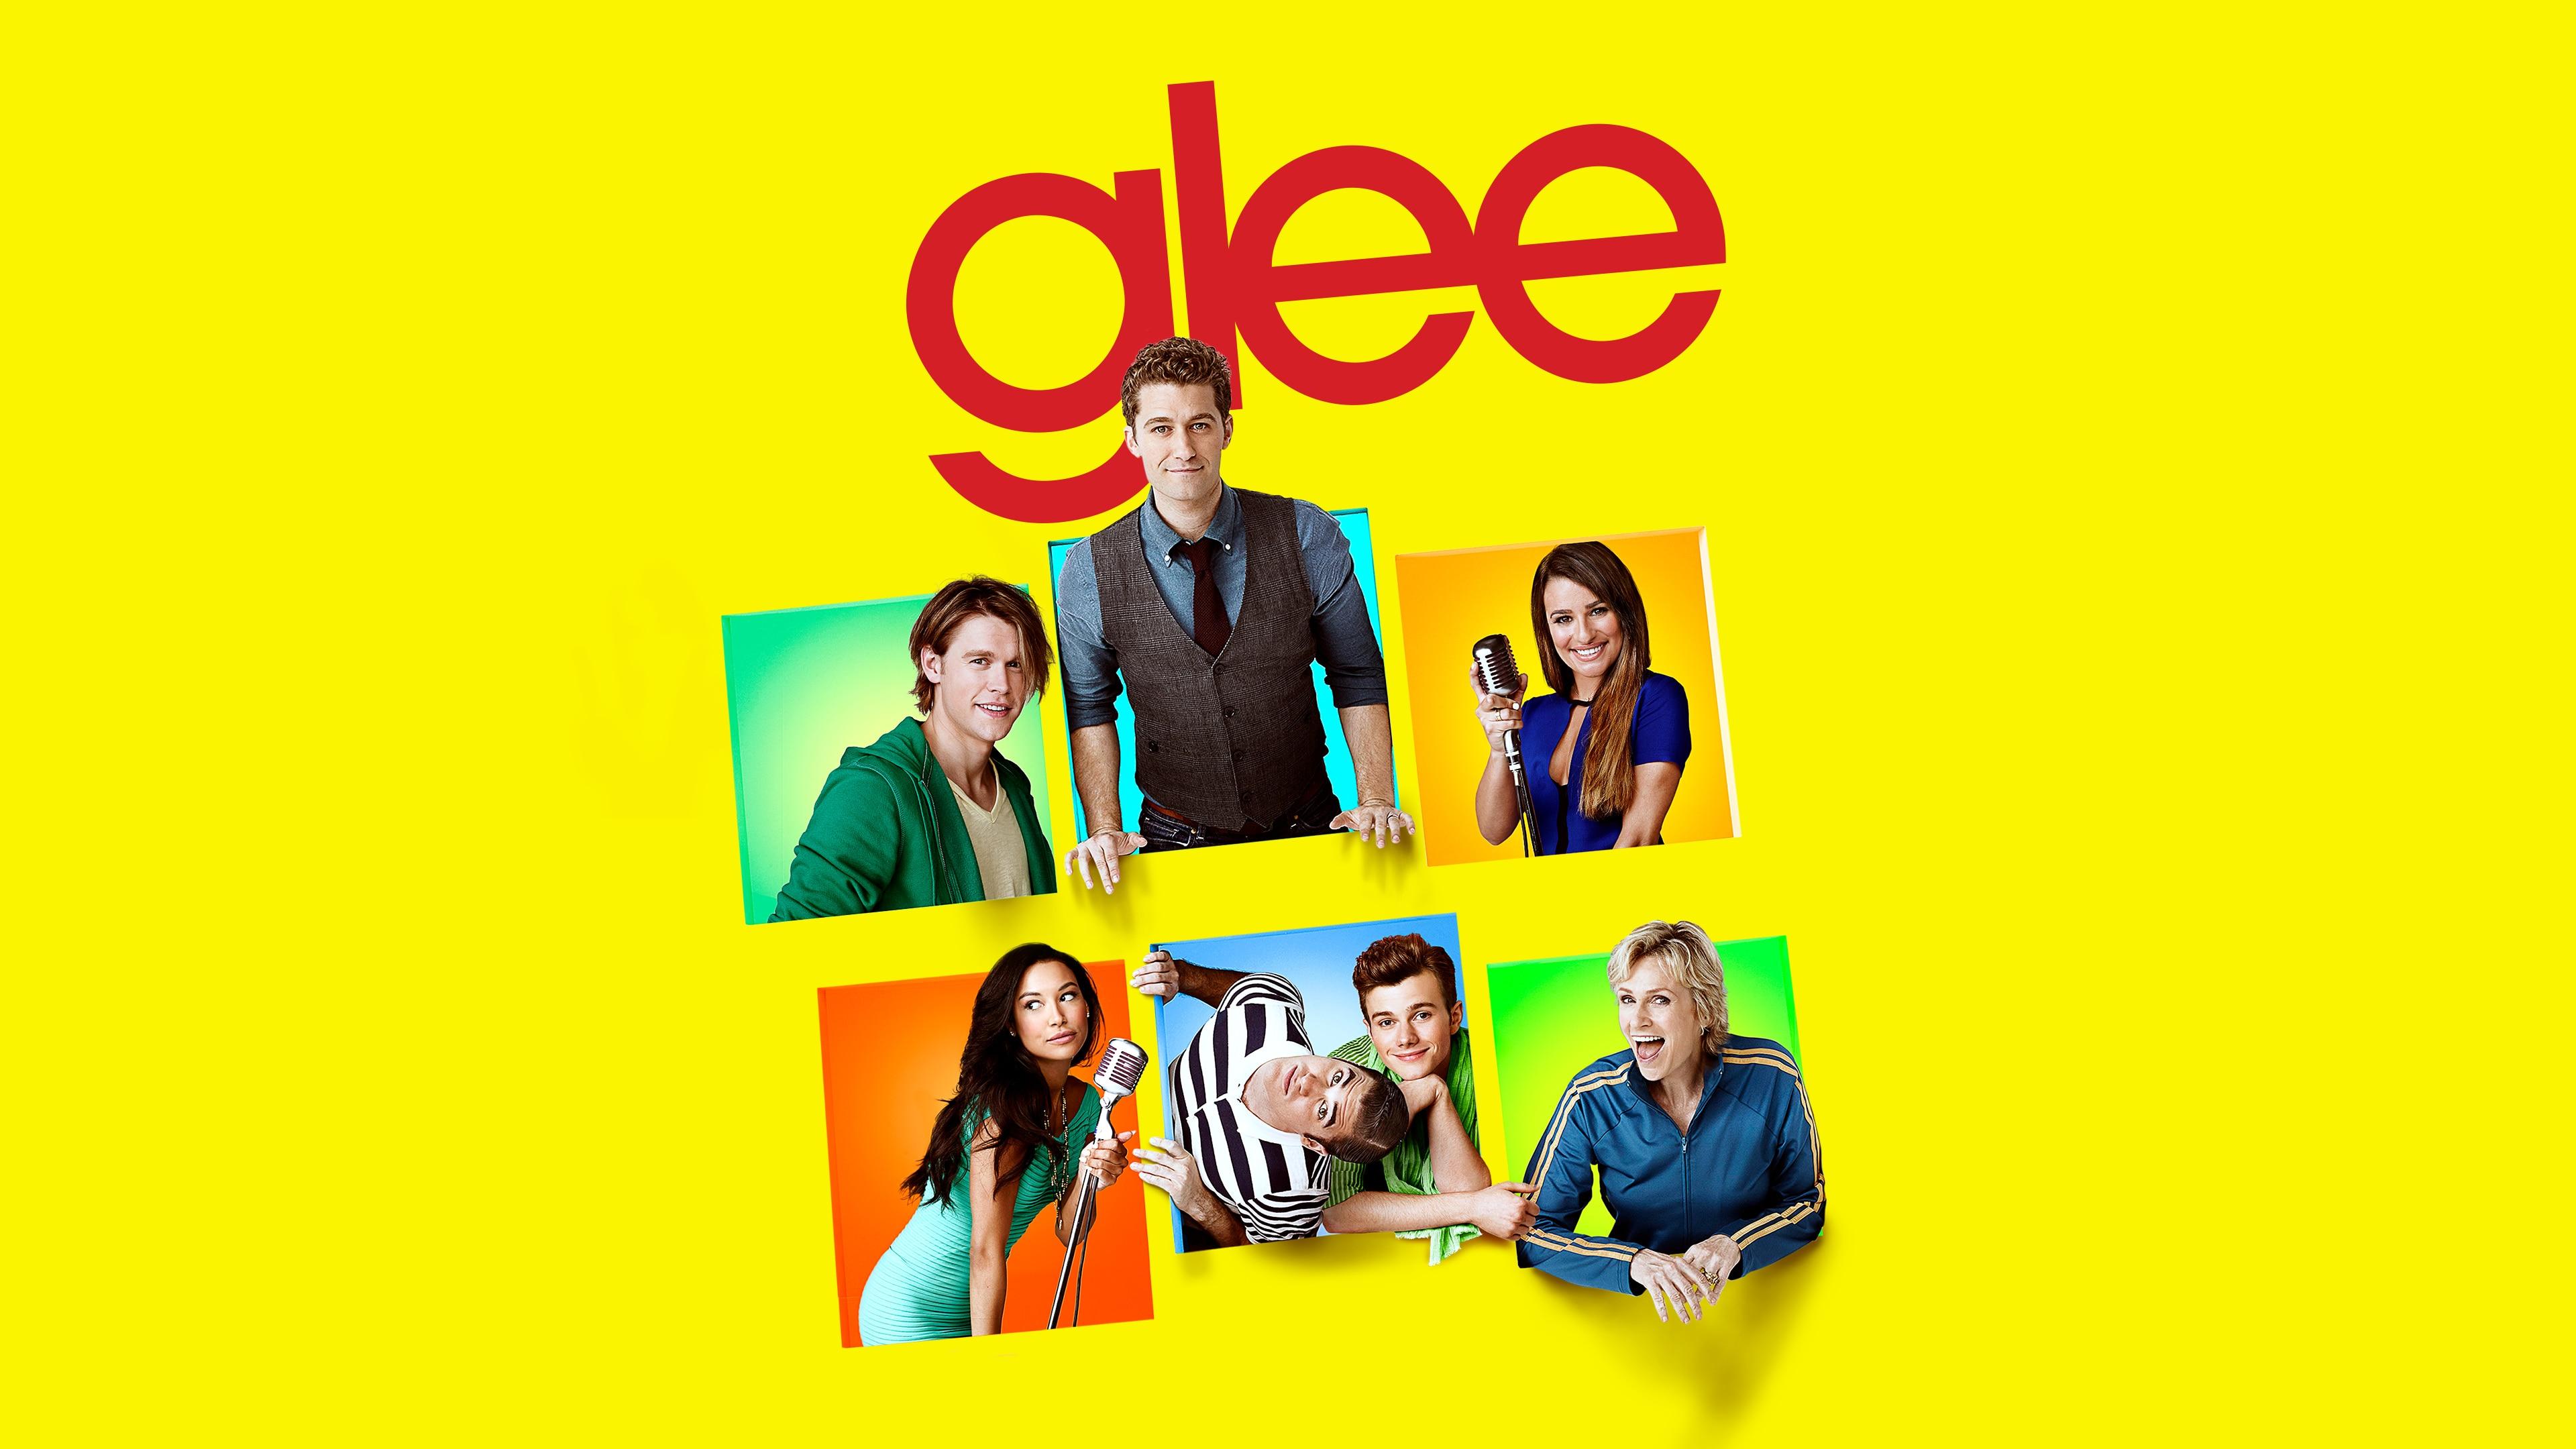 Glee last name download free